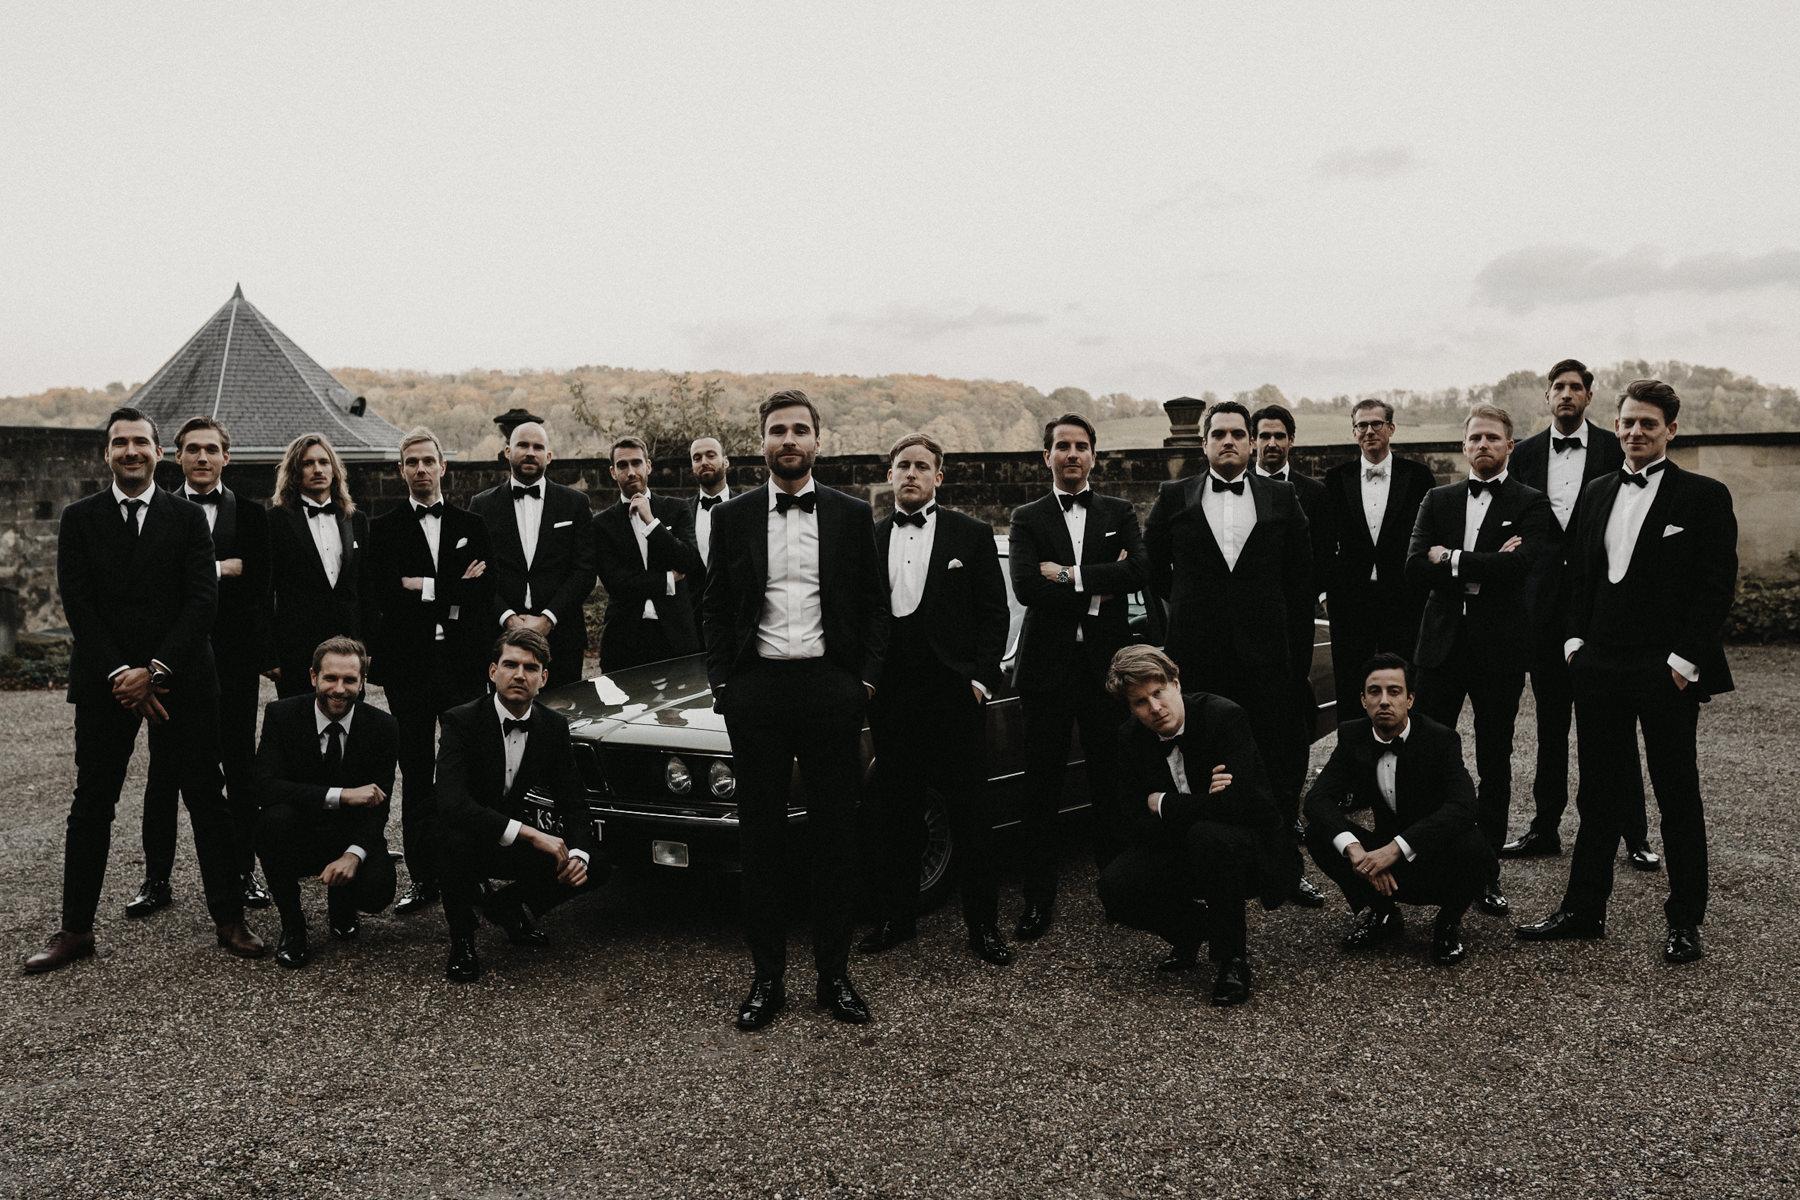 Originele trouwfoto| Mooiste trouwfoto | Beste bruidsfotografie | Groepsfoto bruiloft